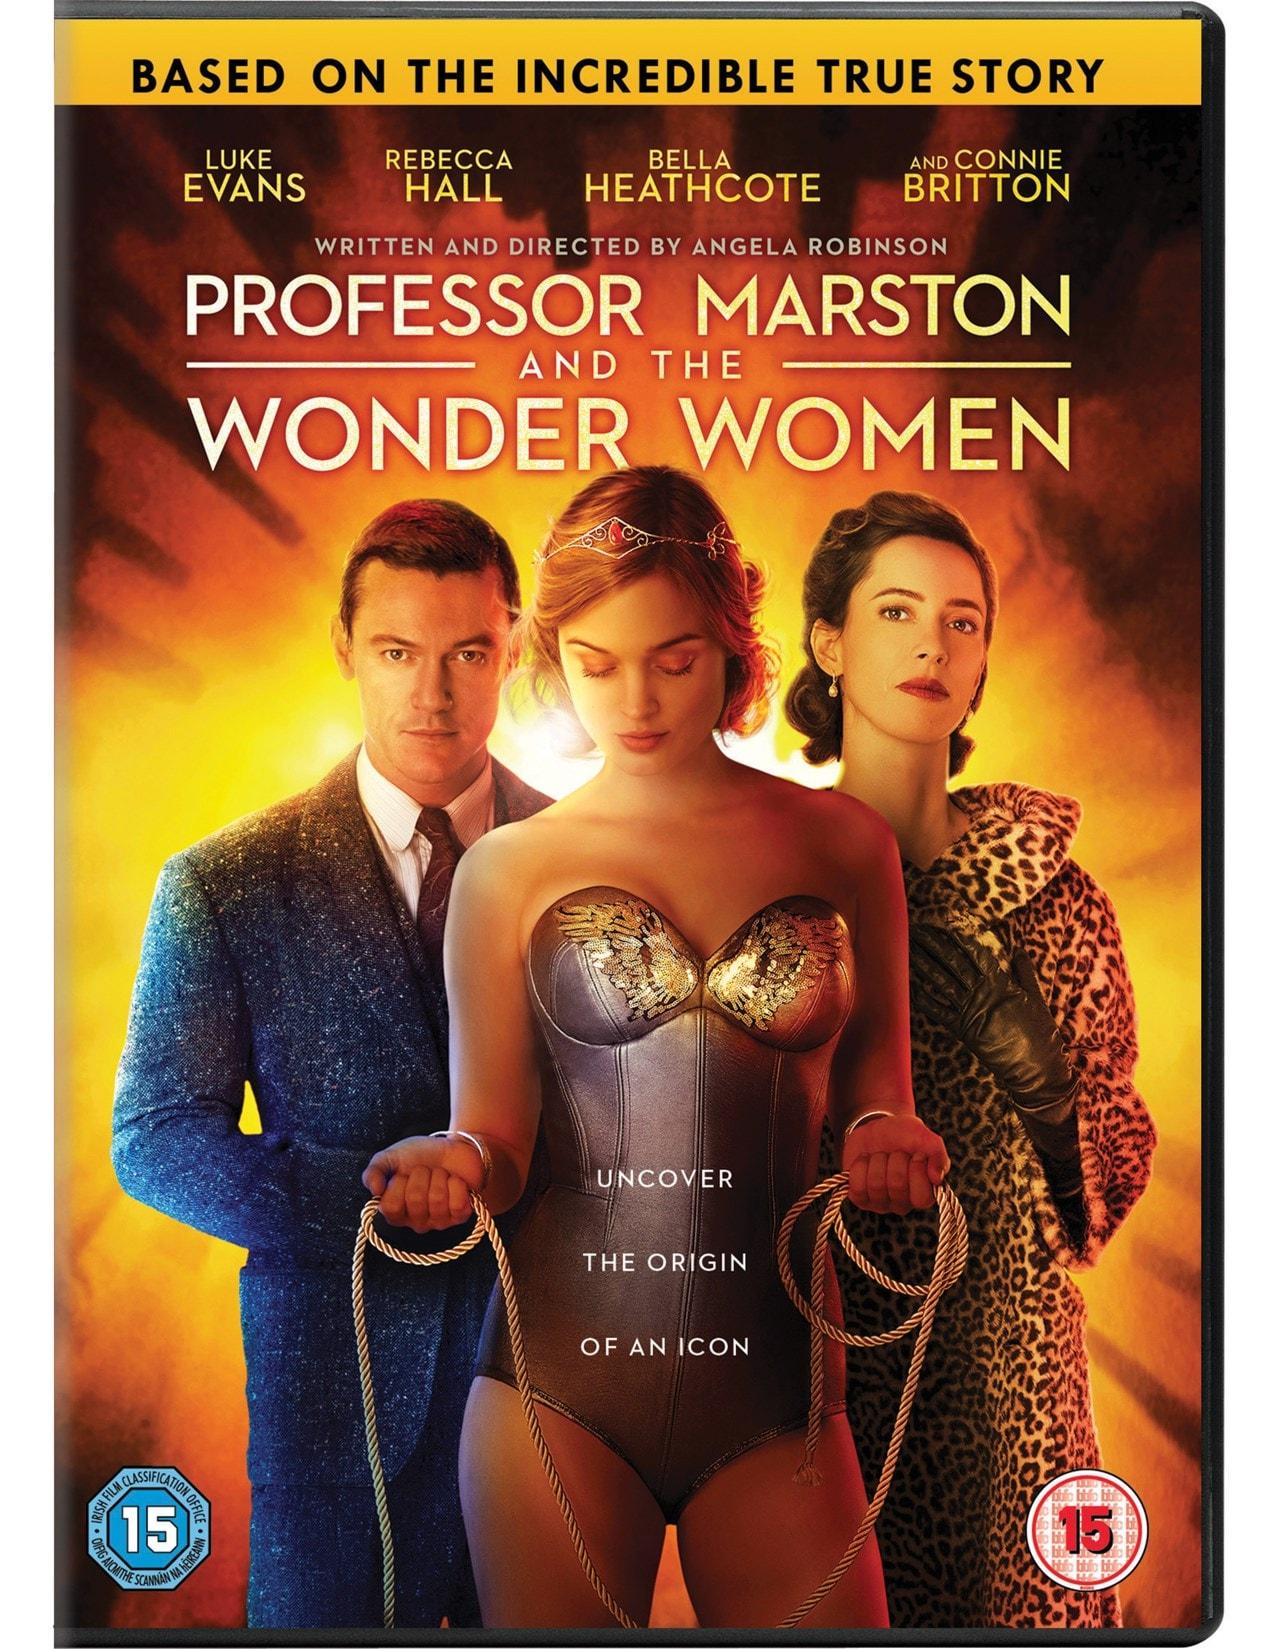 Professor Marston and the Wonder Women - 1